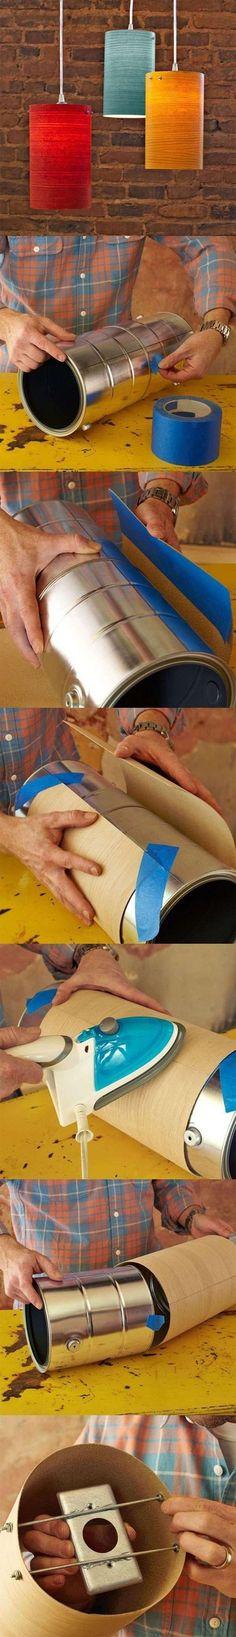 "DIY Une suspension en bois. (<a href=""http://www.lowes.com/creative-ideas/decorate-and-entertain/wood-veneer-pendant-lights/project"" rel=""nofollow"" target=""_blank"">www.lowes.com/...</a>)"